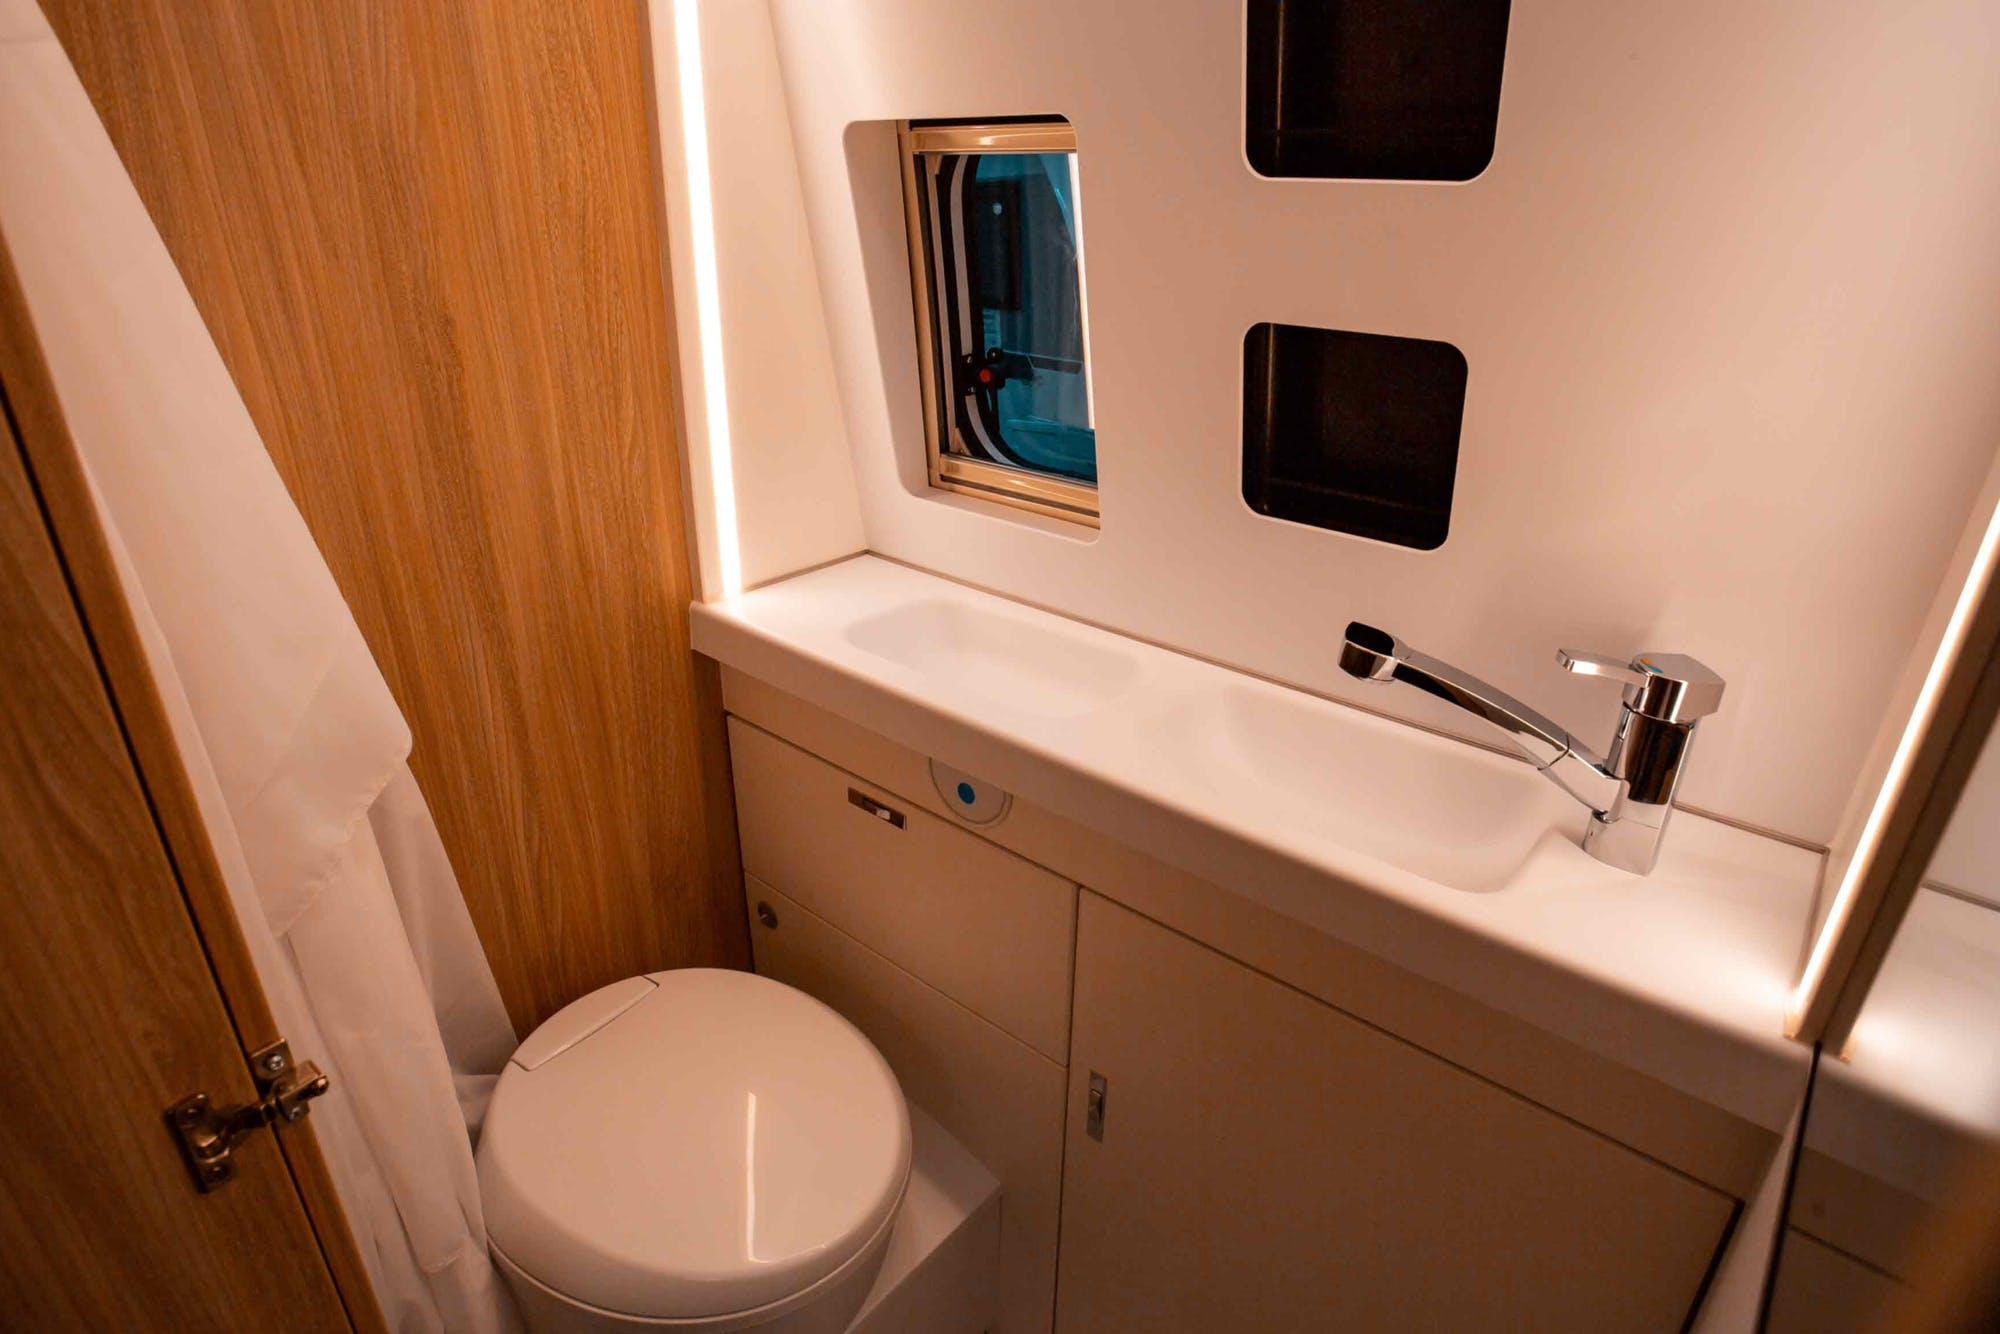 Nomad Model's bathroom